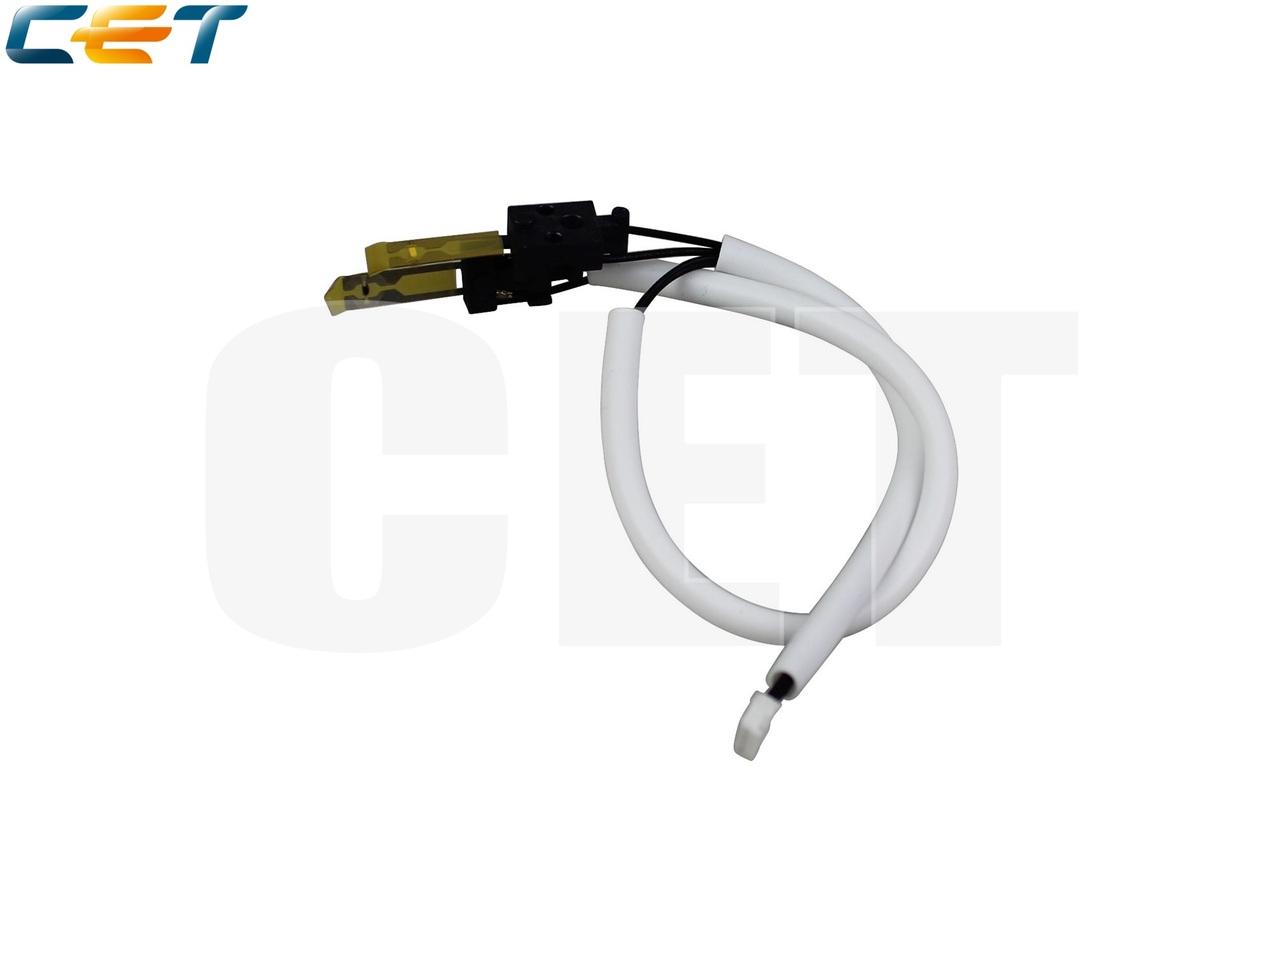 Термистор D009-4177 для RICOH AficioMP4000/MP5000/MP4000B/MP5000B (CET), CET6080